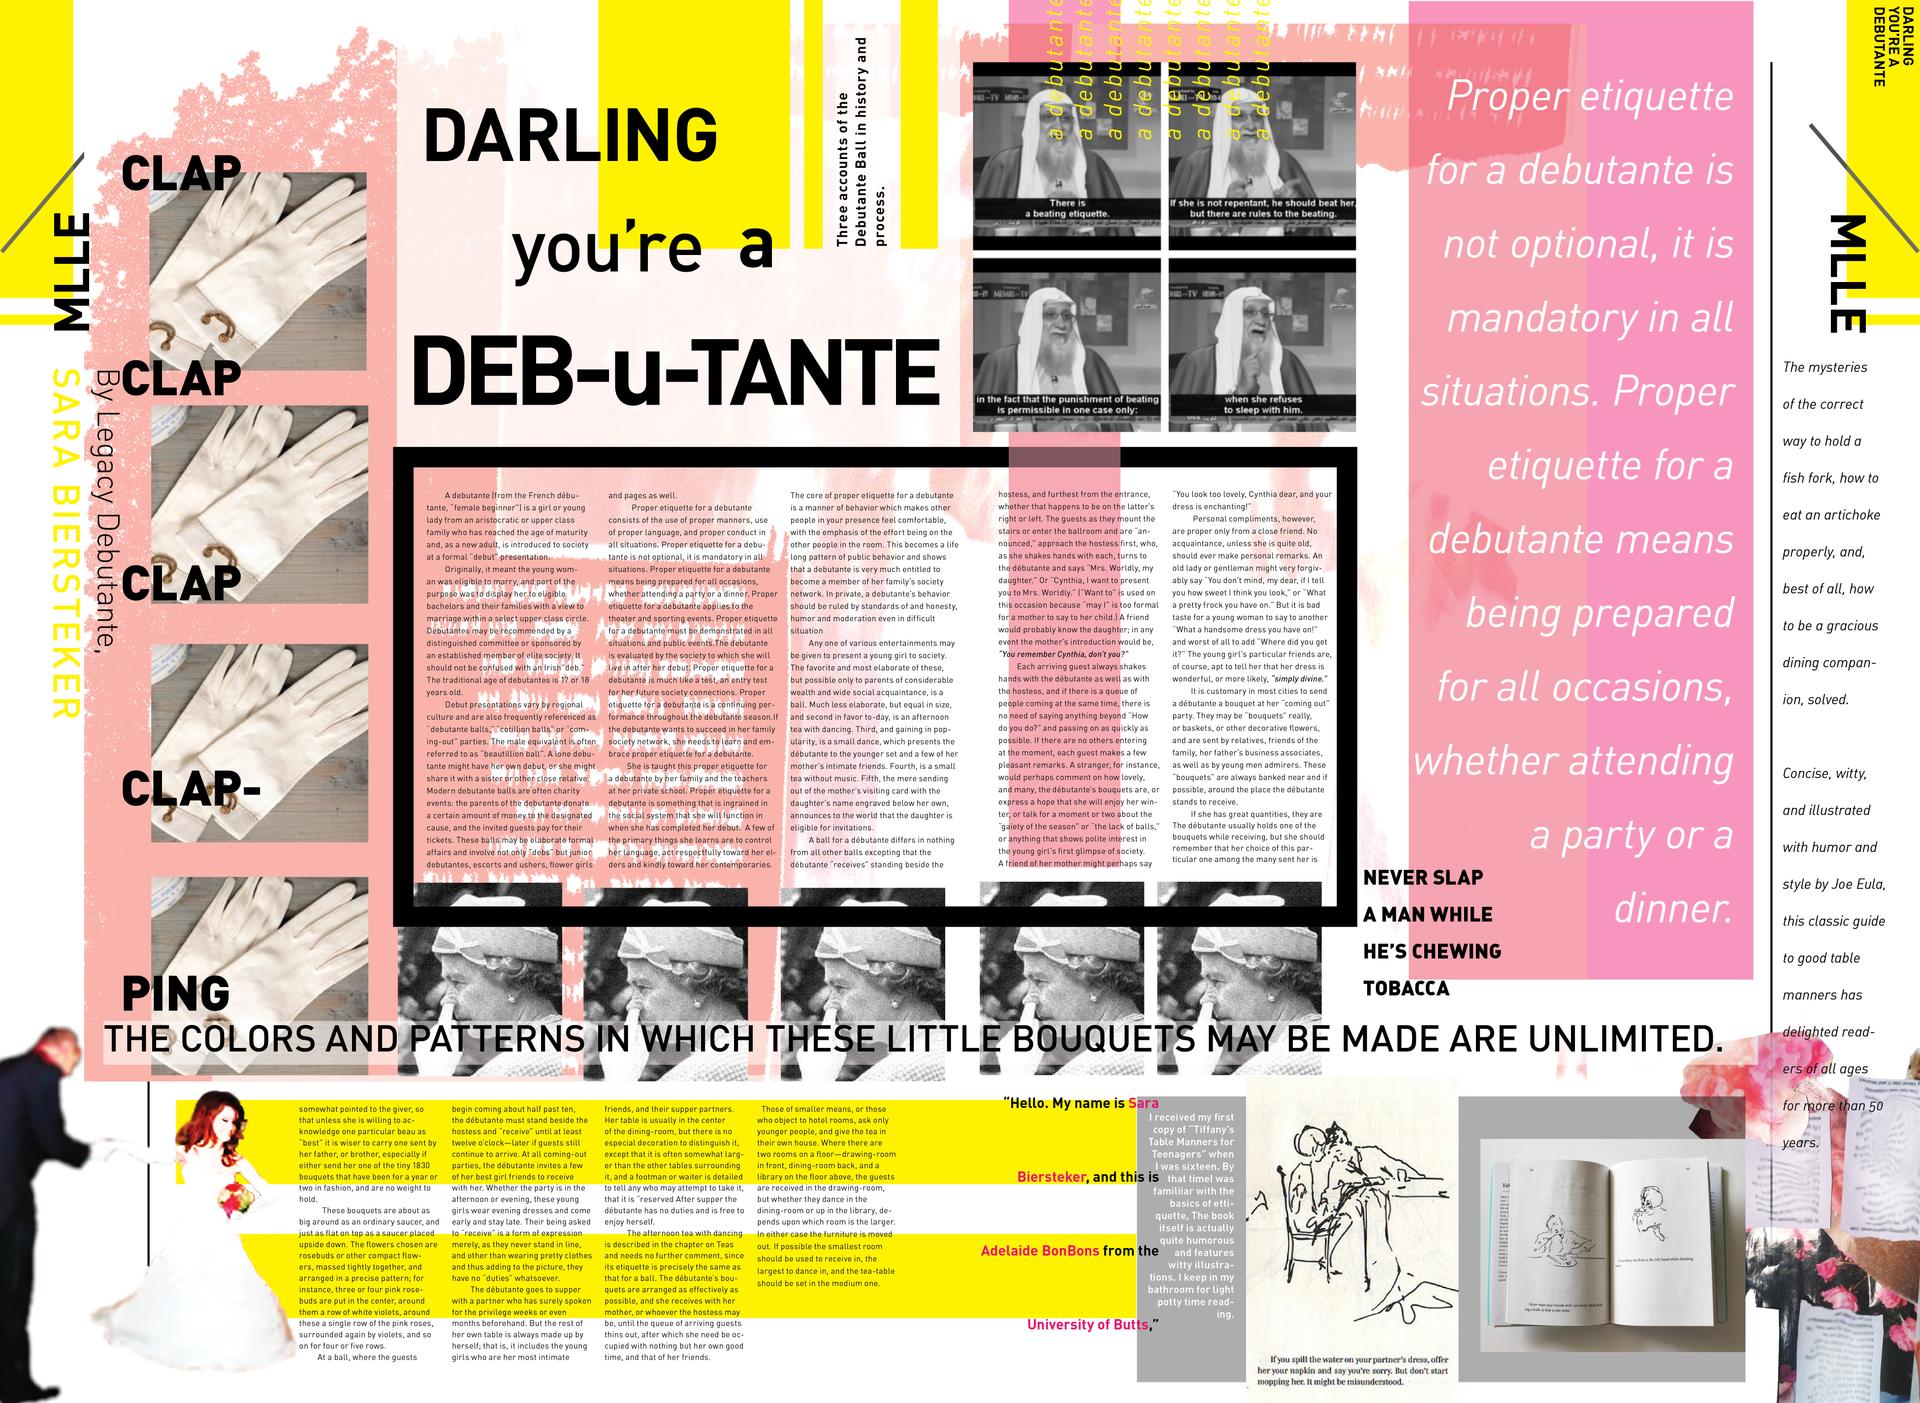 Darling You're a Debutante